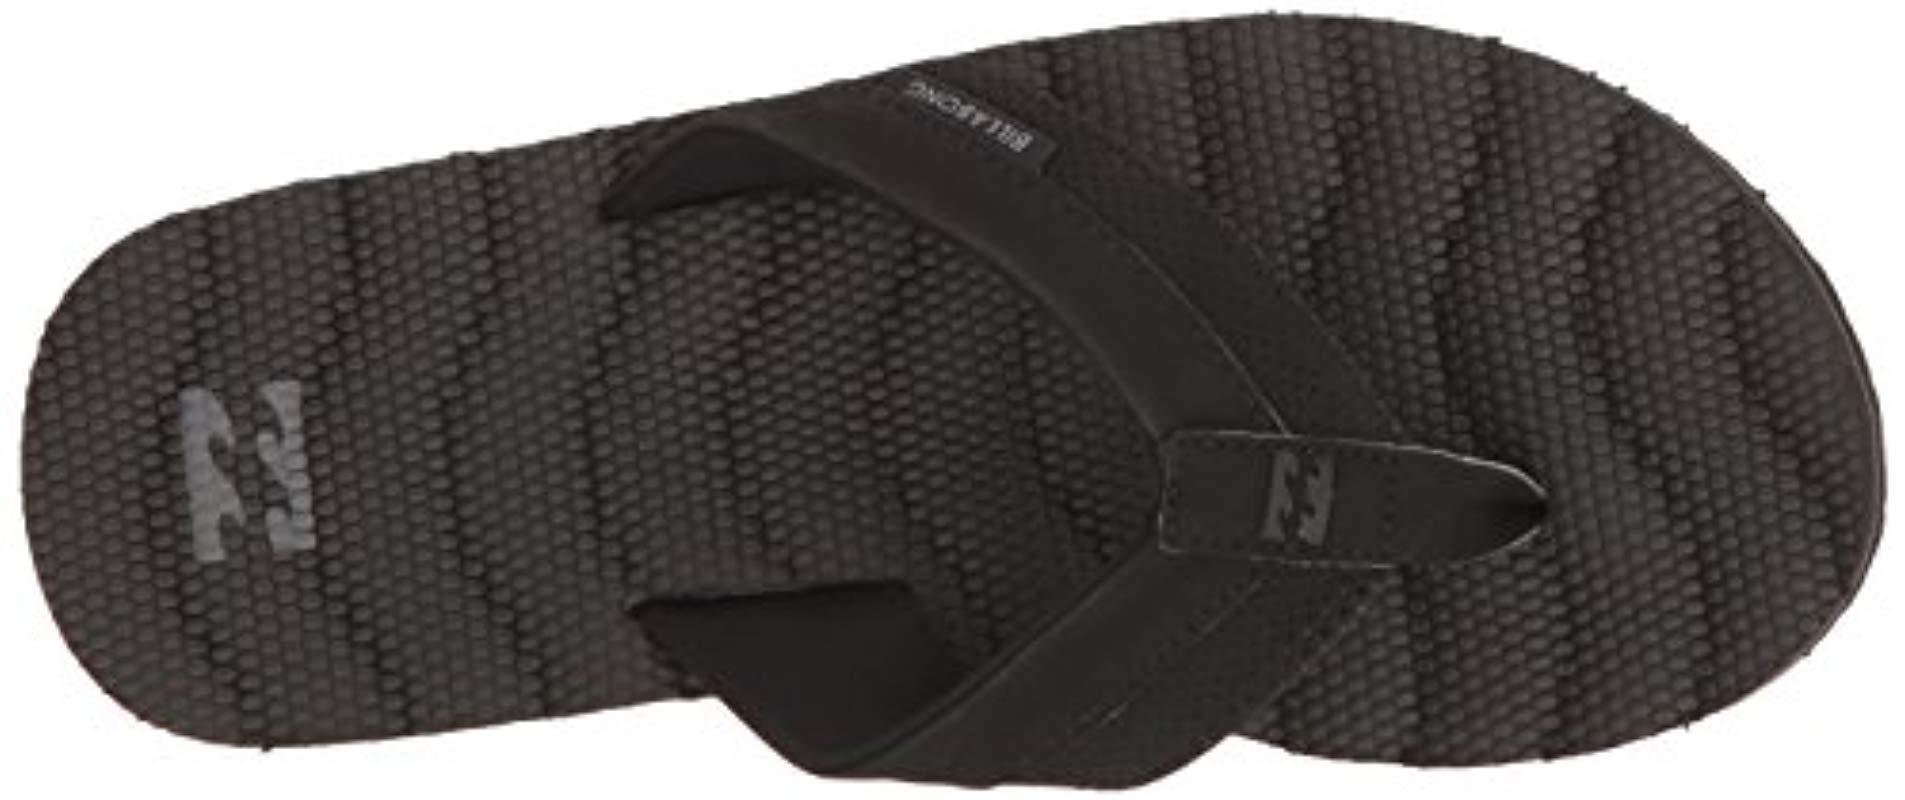 c23f77574d94f Lyst - Billabong Dunes Impact Sandal in Black for Men - Save 41%